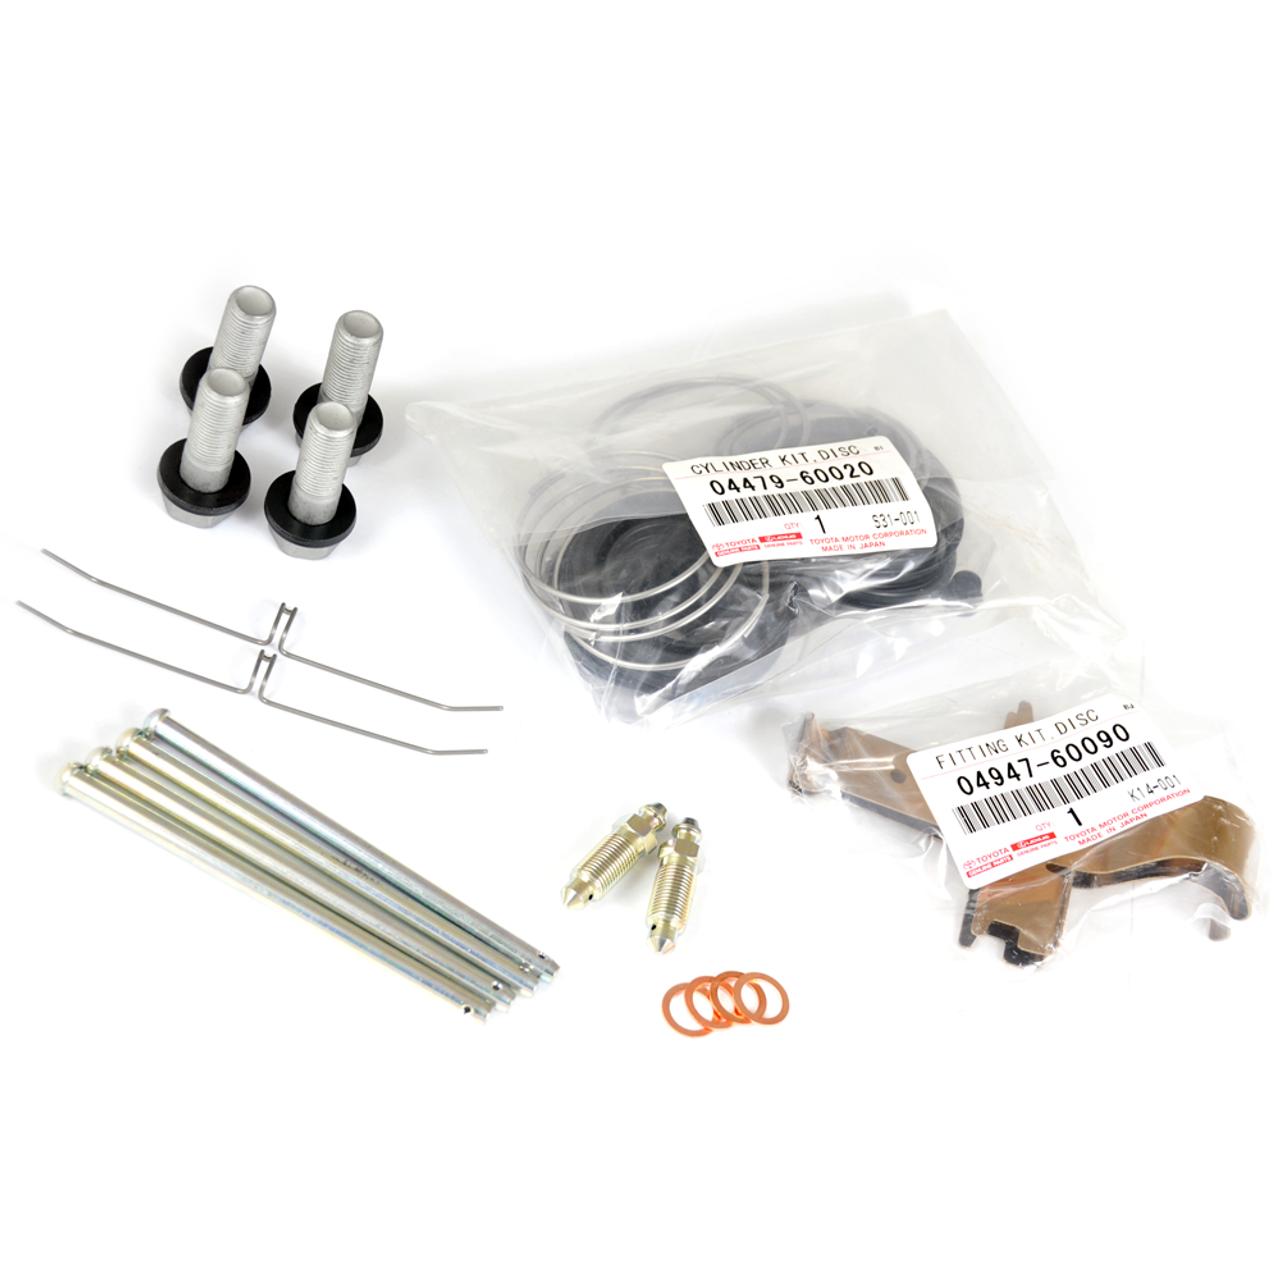 80 Series Land Cruiser Caliper Rebuild Kits- Front Set, 8/92-1/98 (CRK-1)